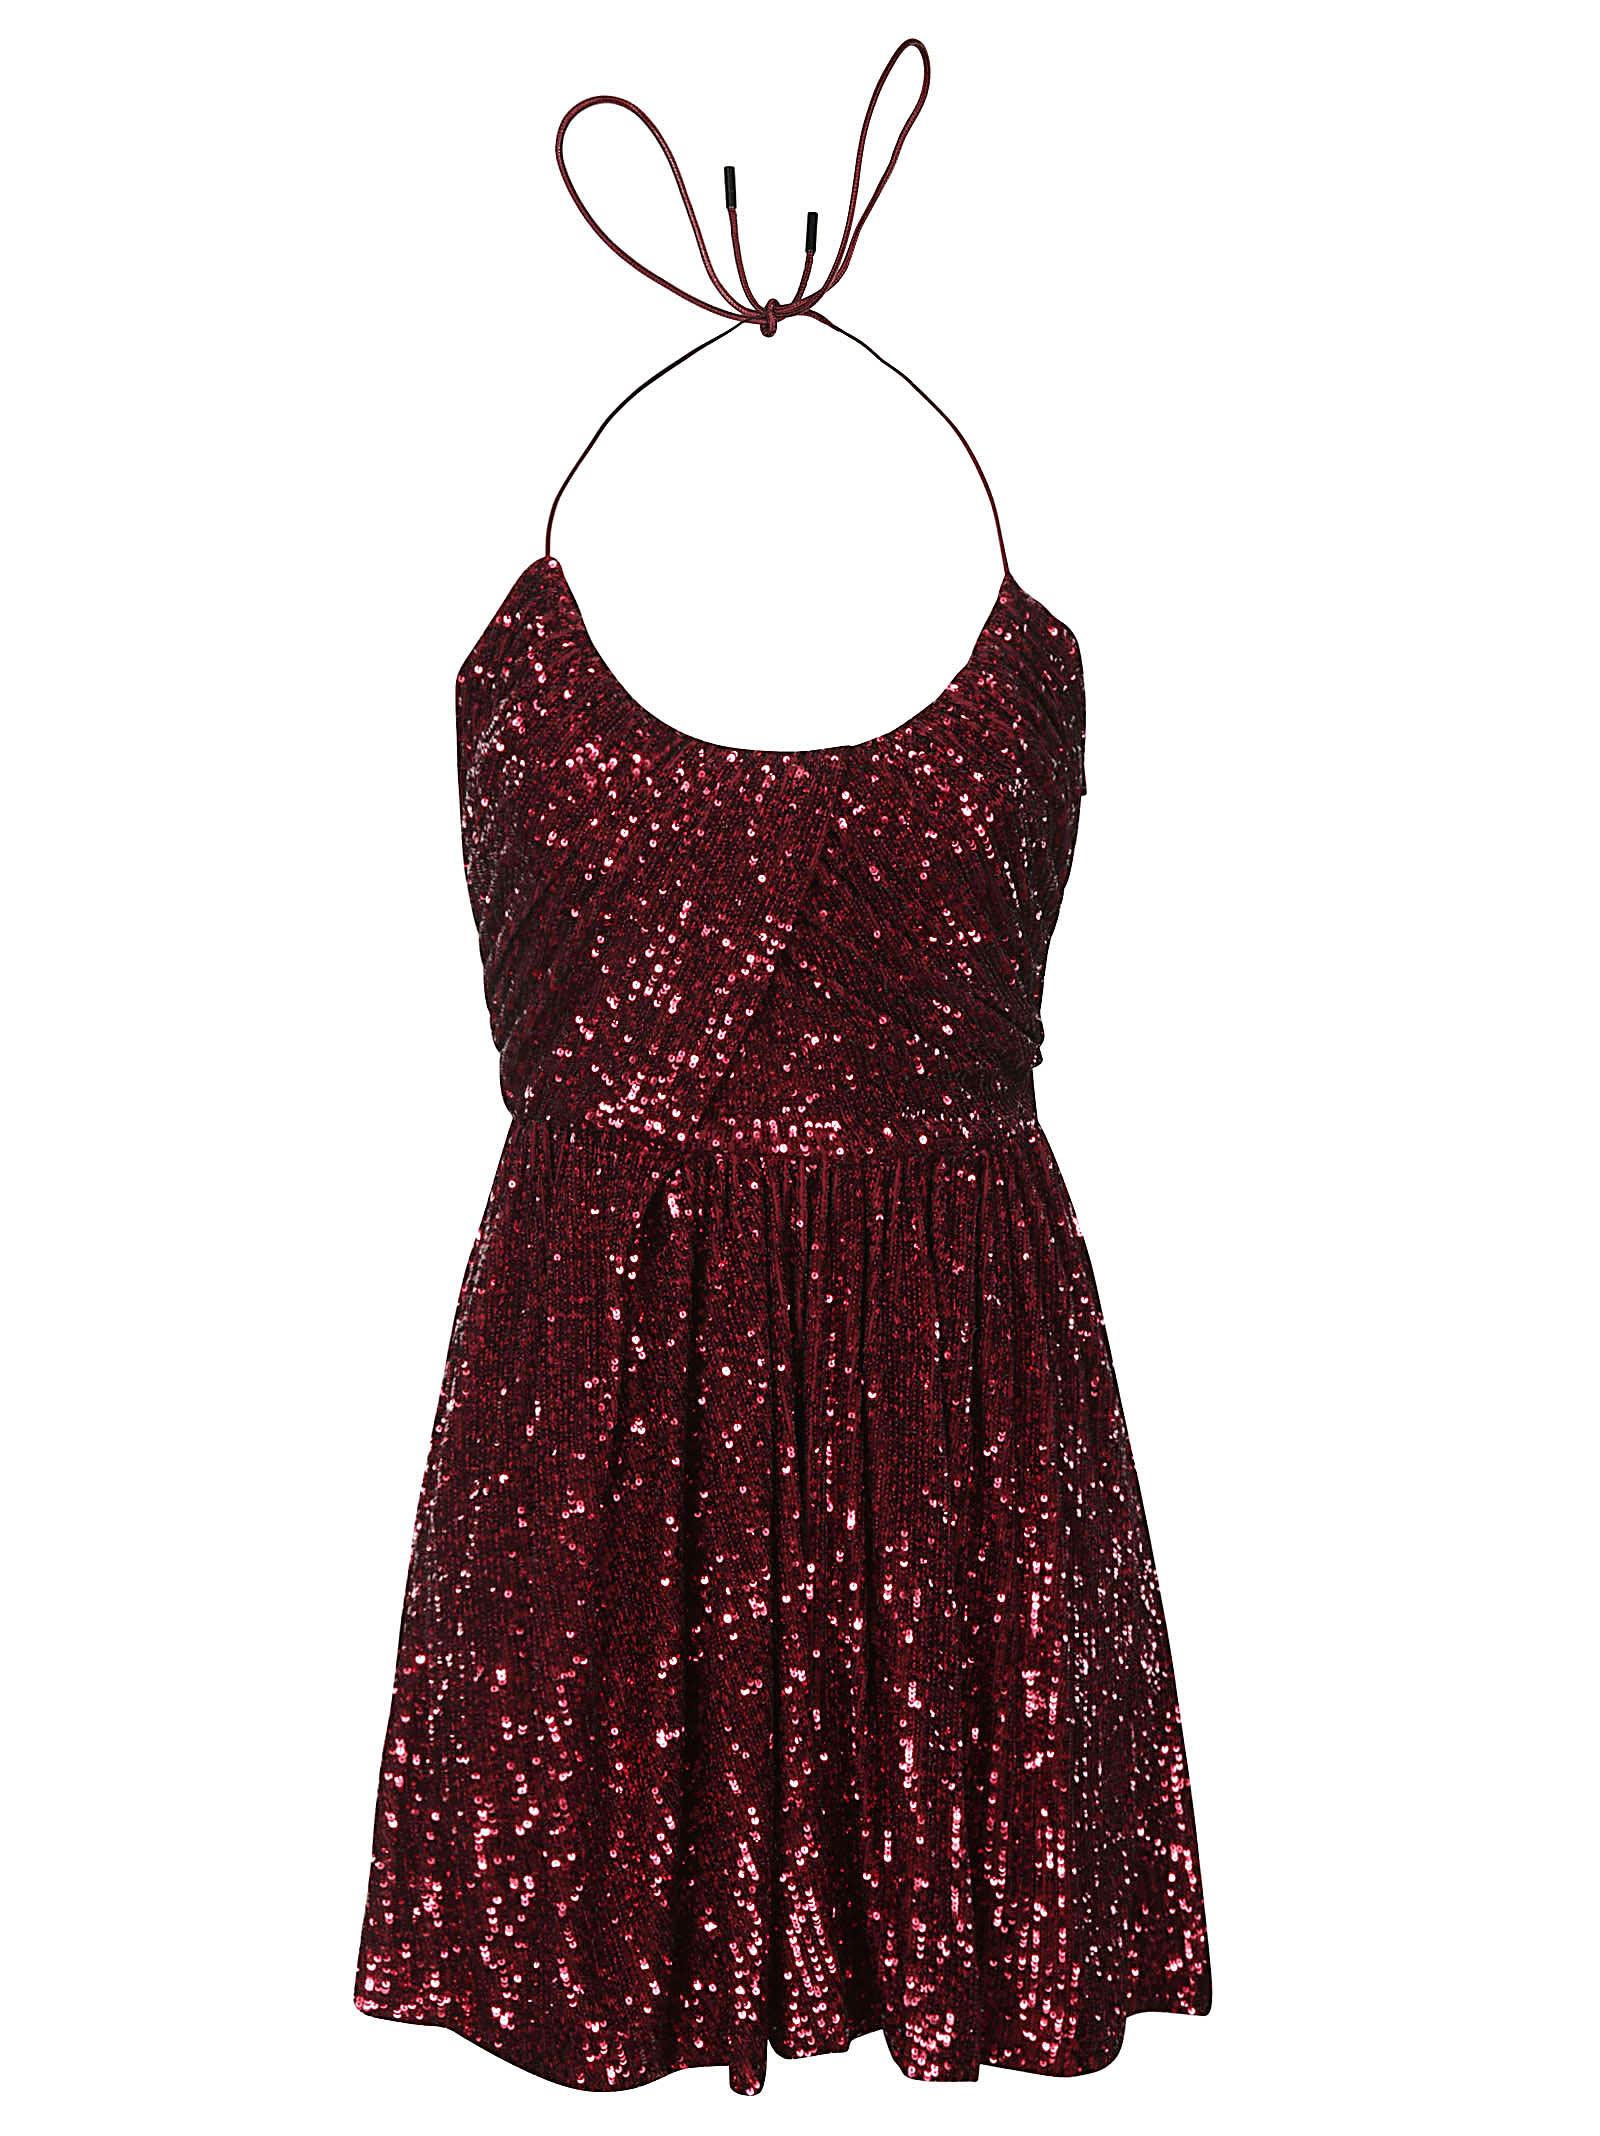 Saint Laurent Sequin-coated Sleeveless Short Dress